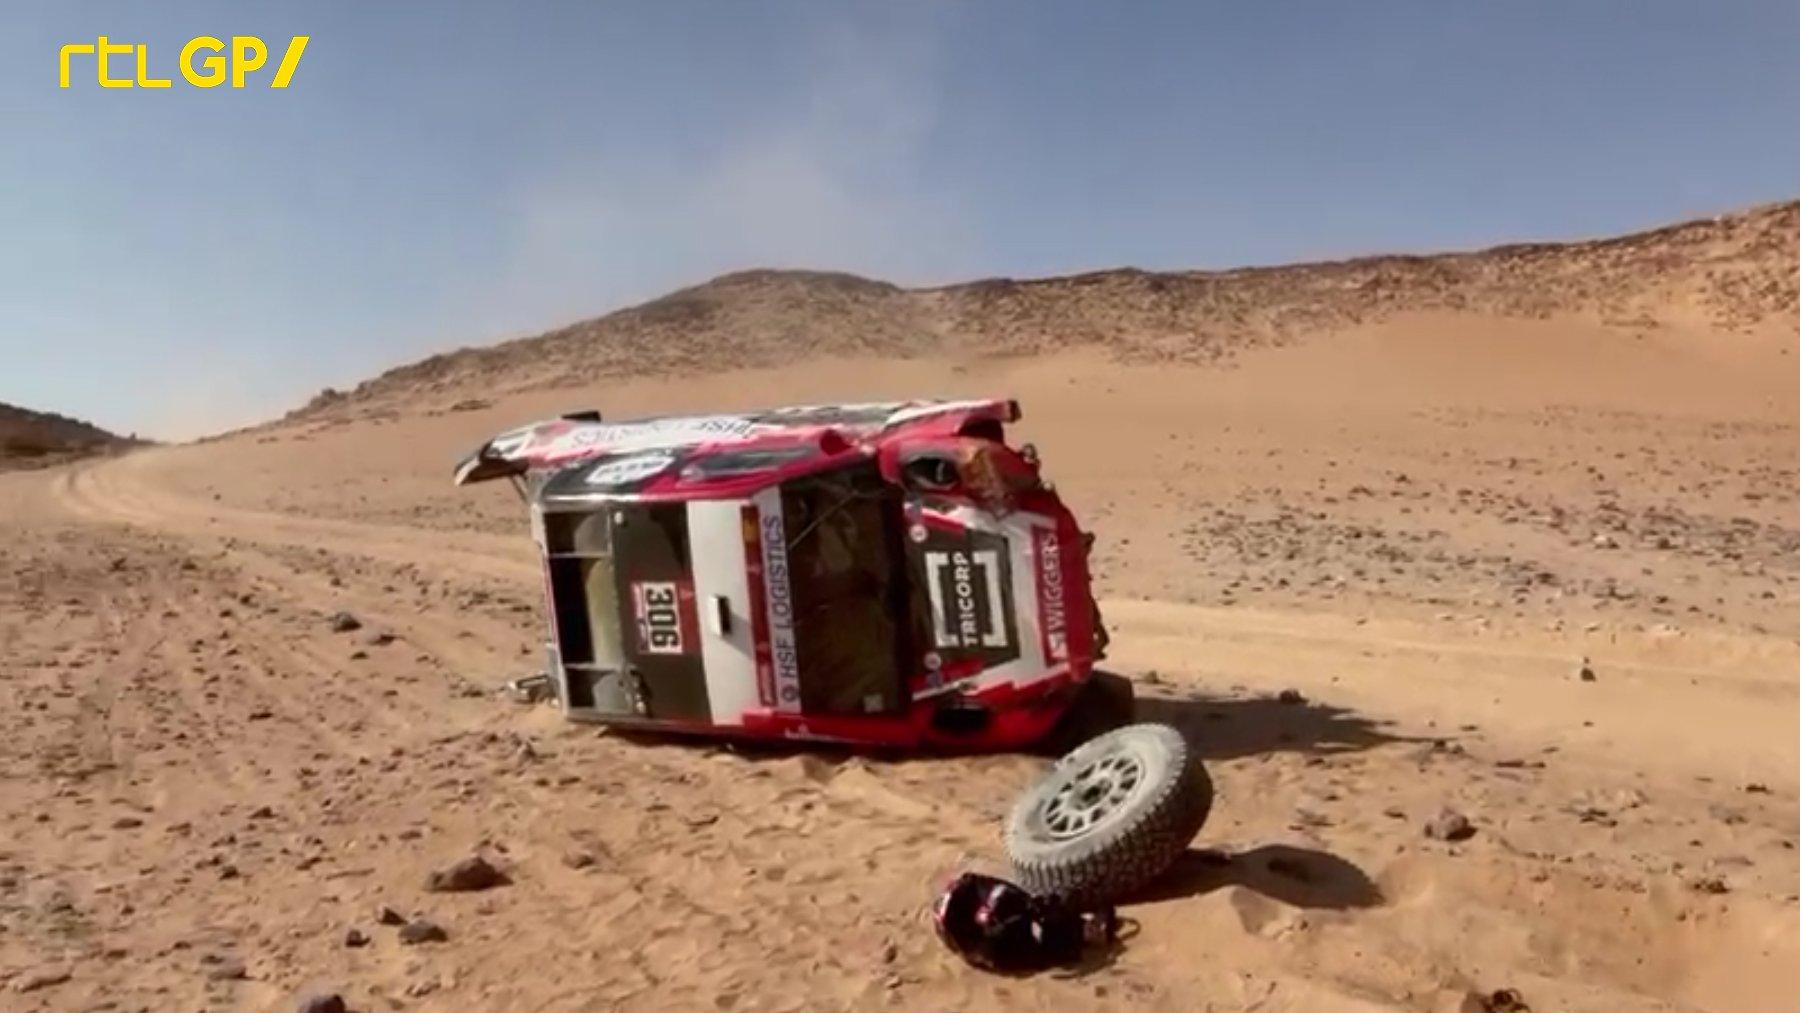 2021 43º Rallye Raid Dakar - Arabia Saudí [3-15 Enero] - Página 8 Eq-c_lIVkAATeDy?format=jpg&name=large